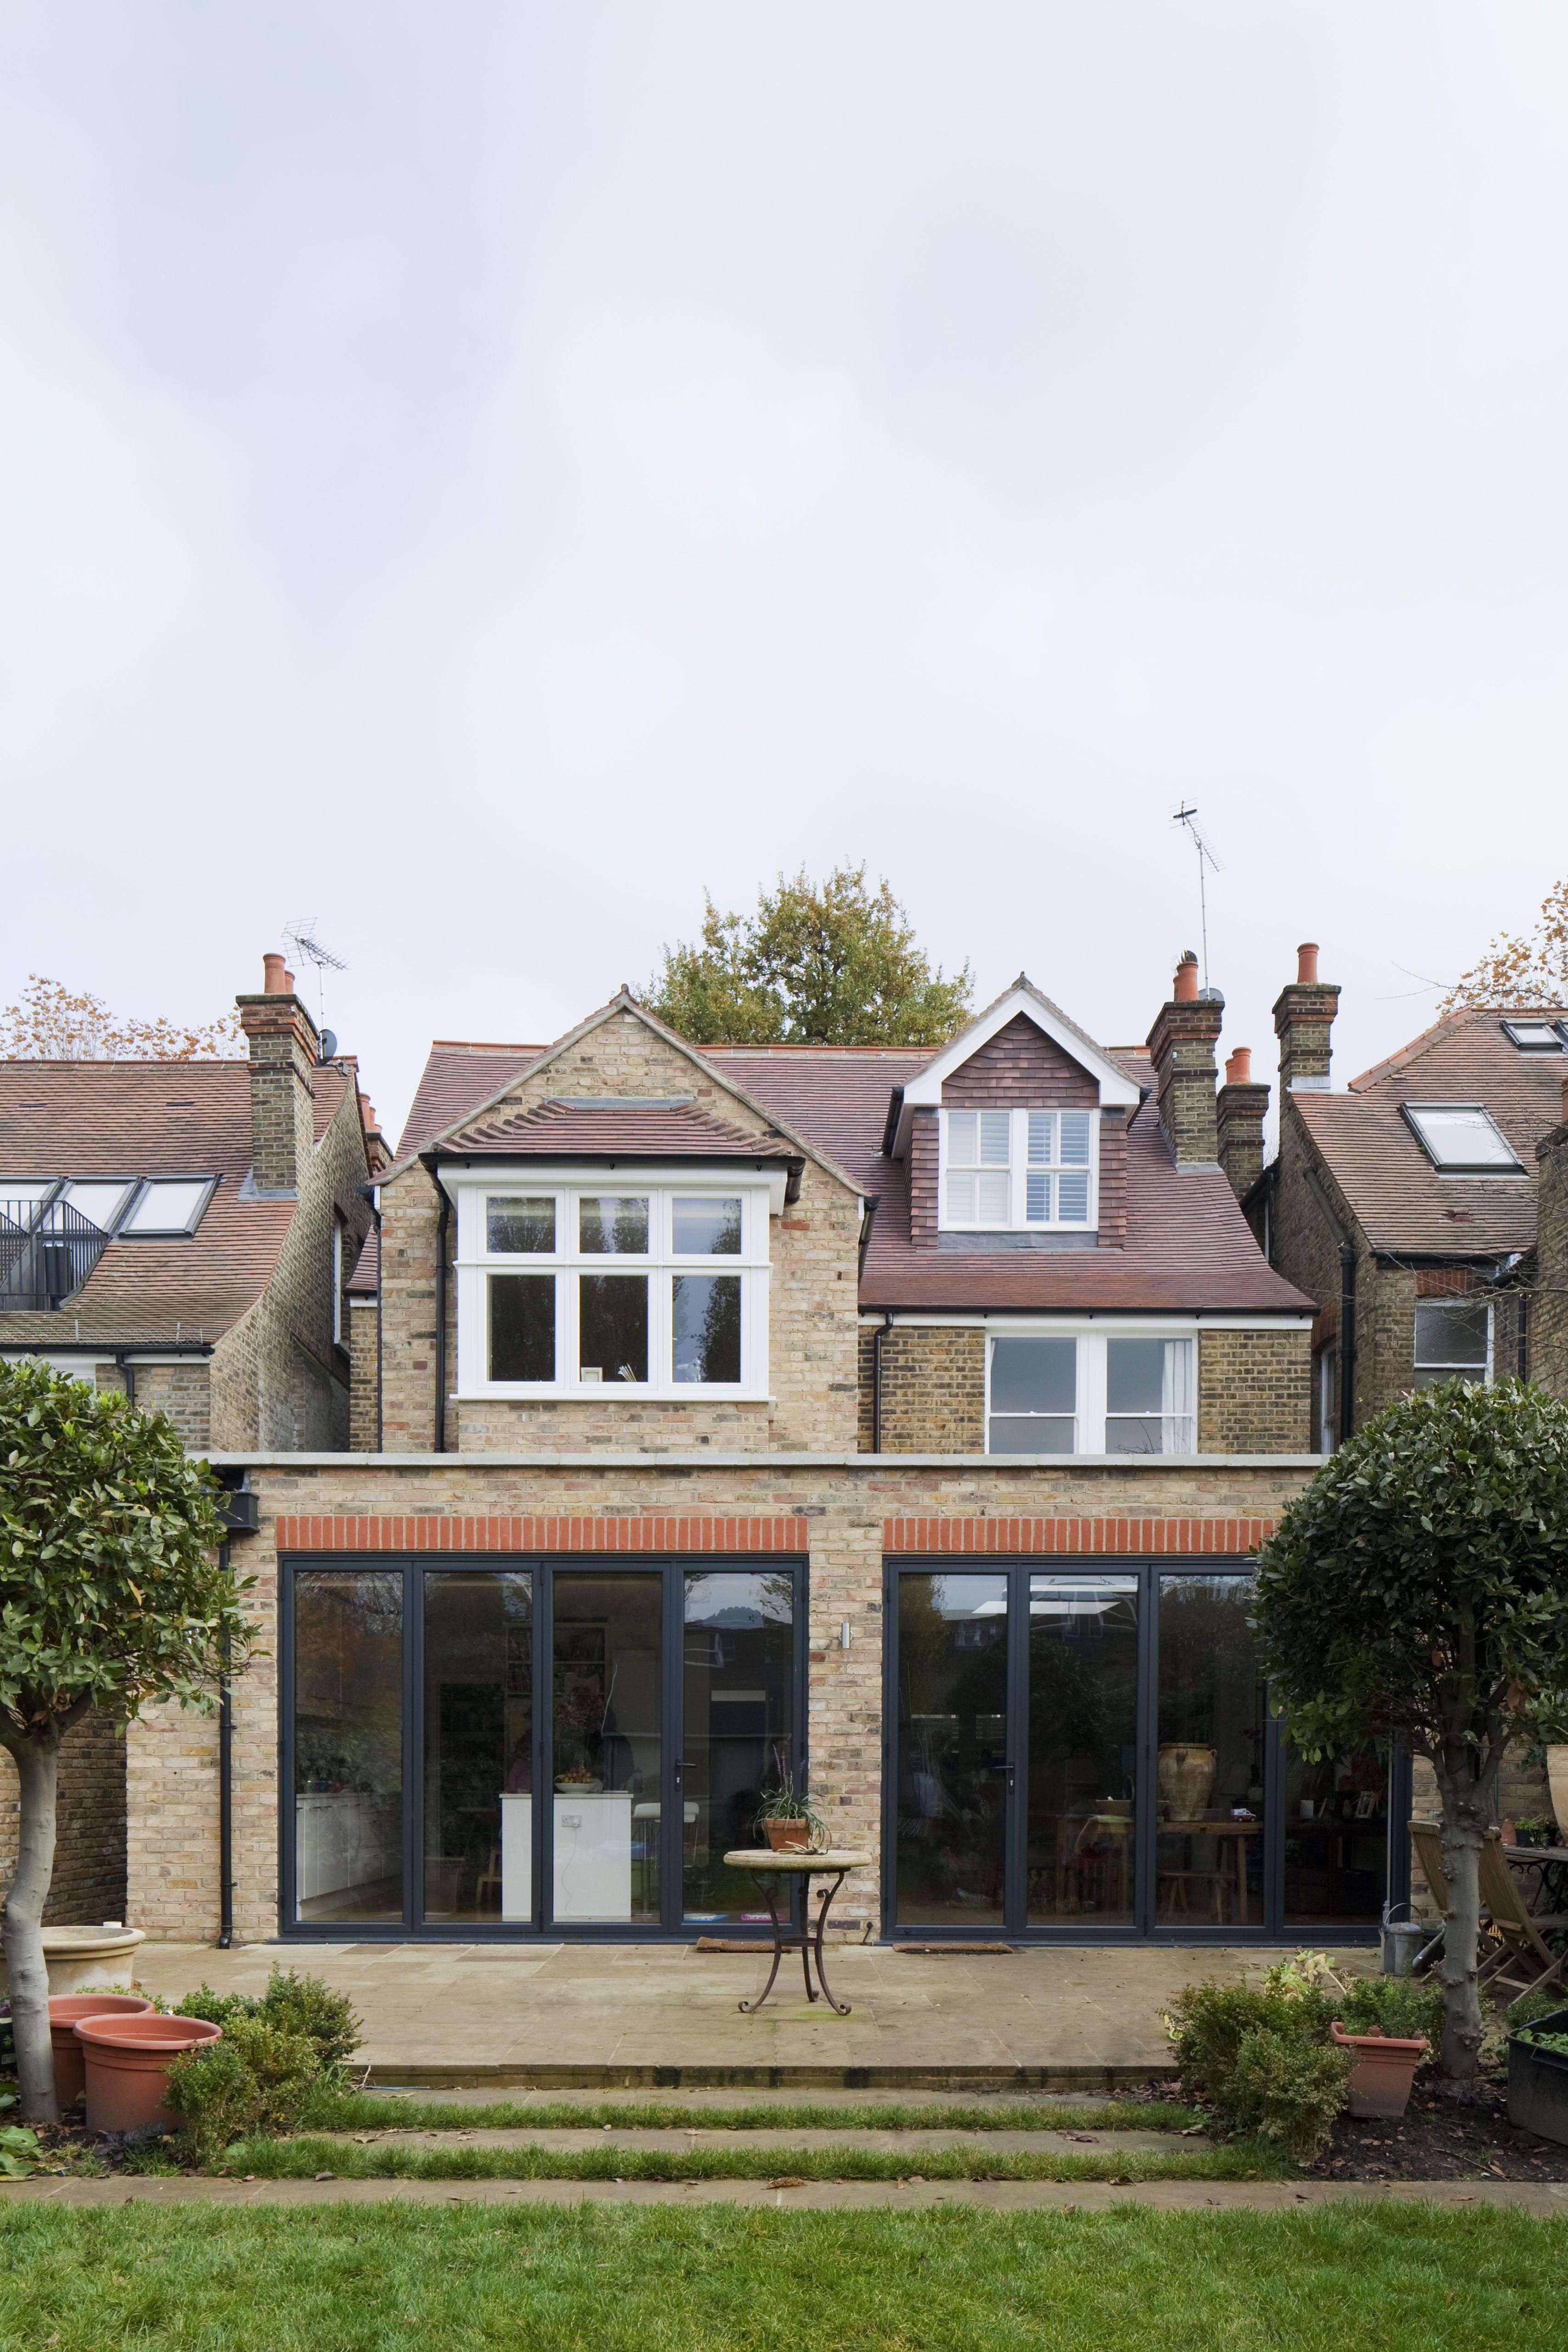 Rear Extension - Brick - Flat Roof - Hidden Drainage